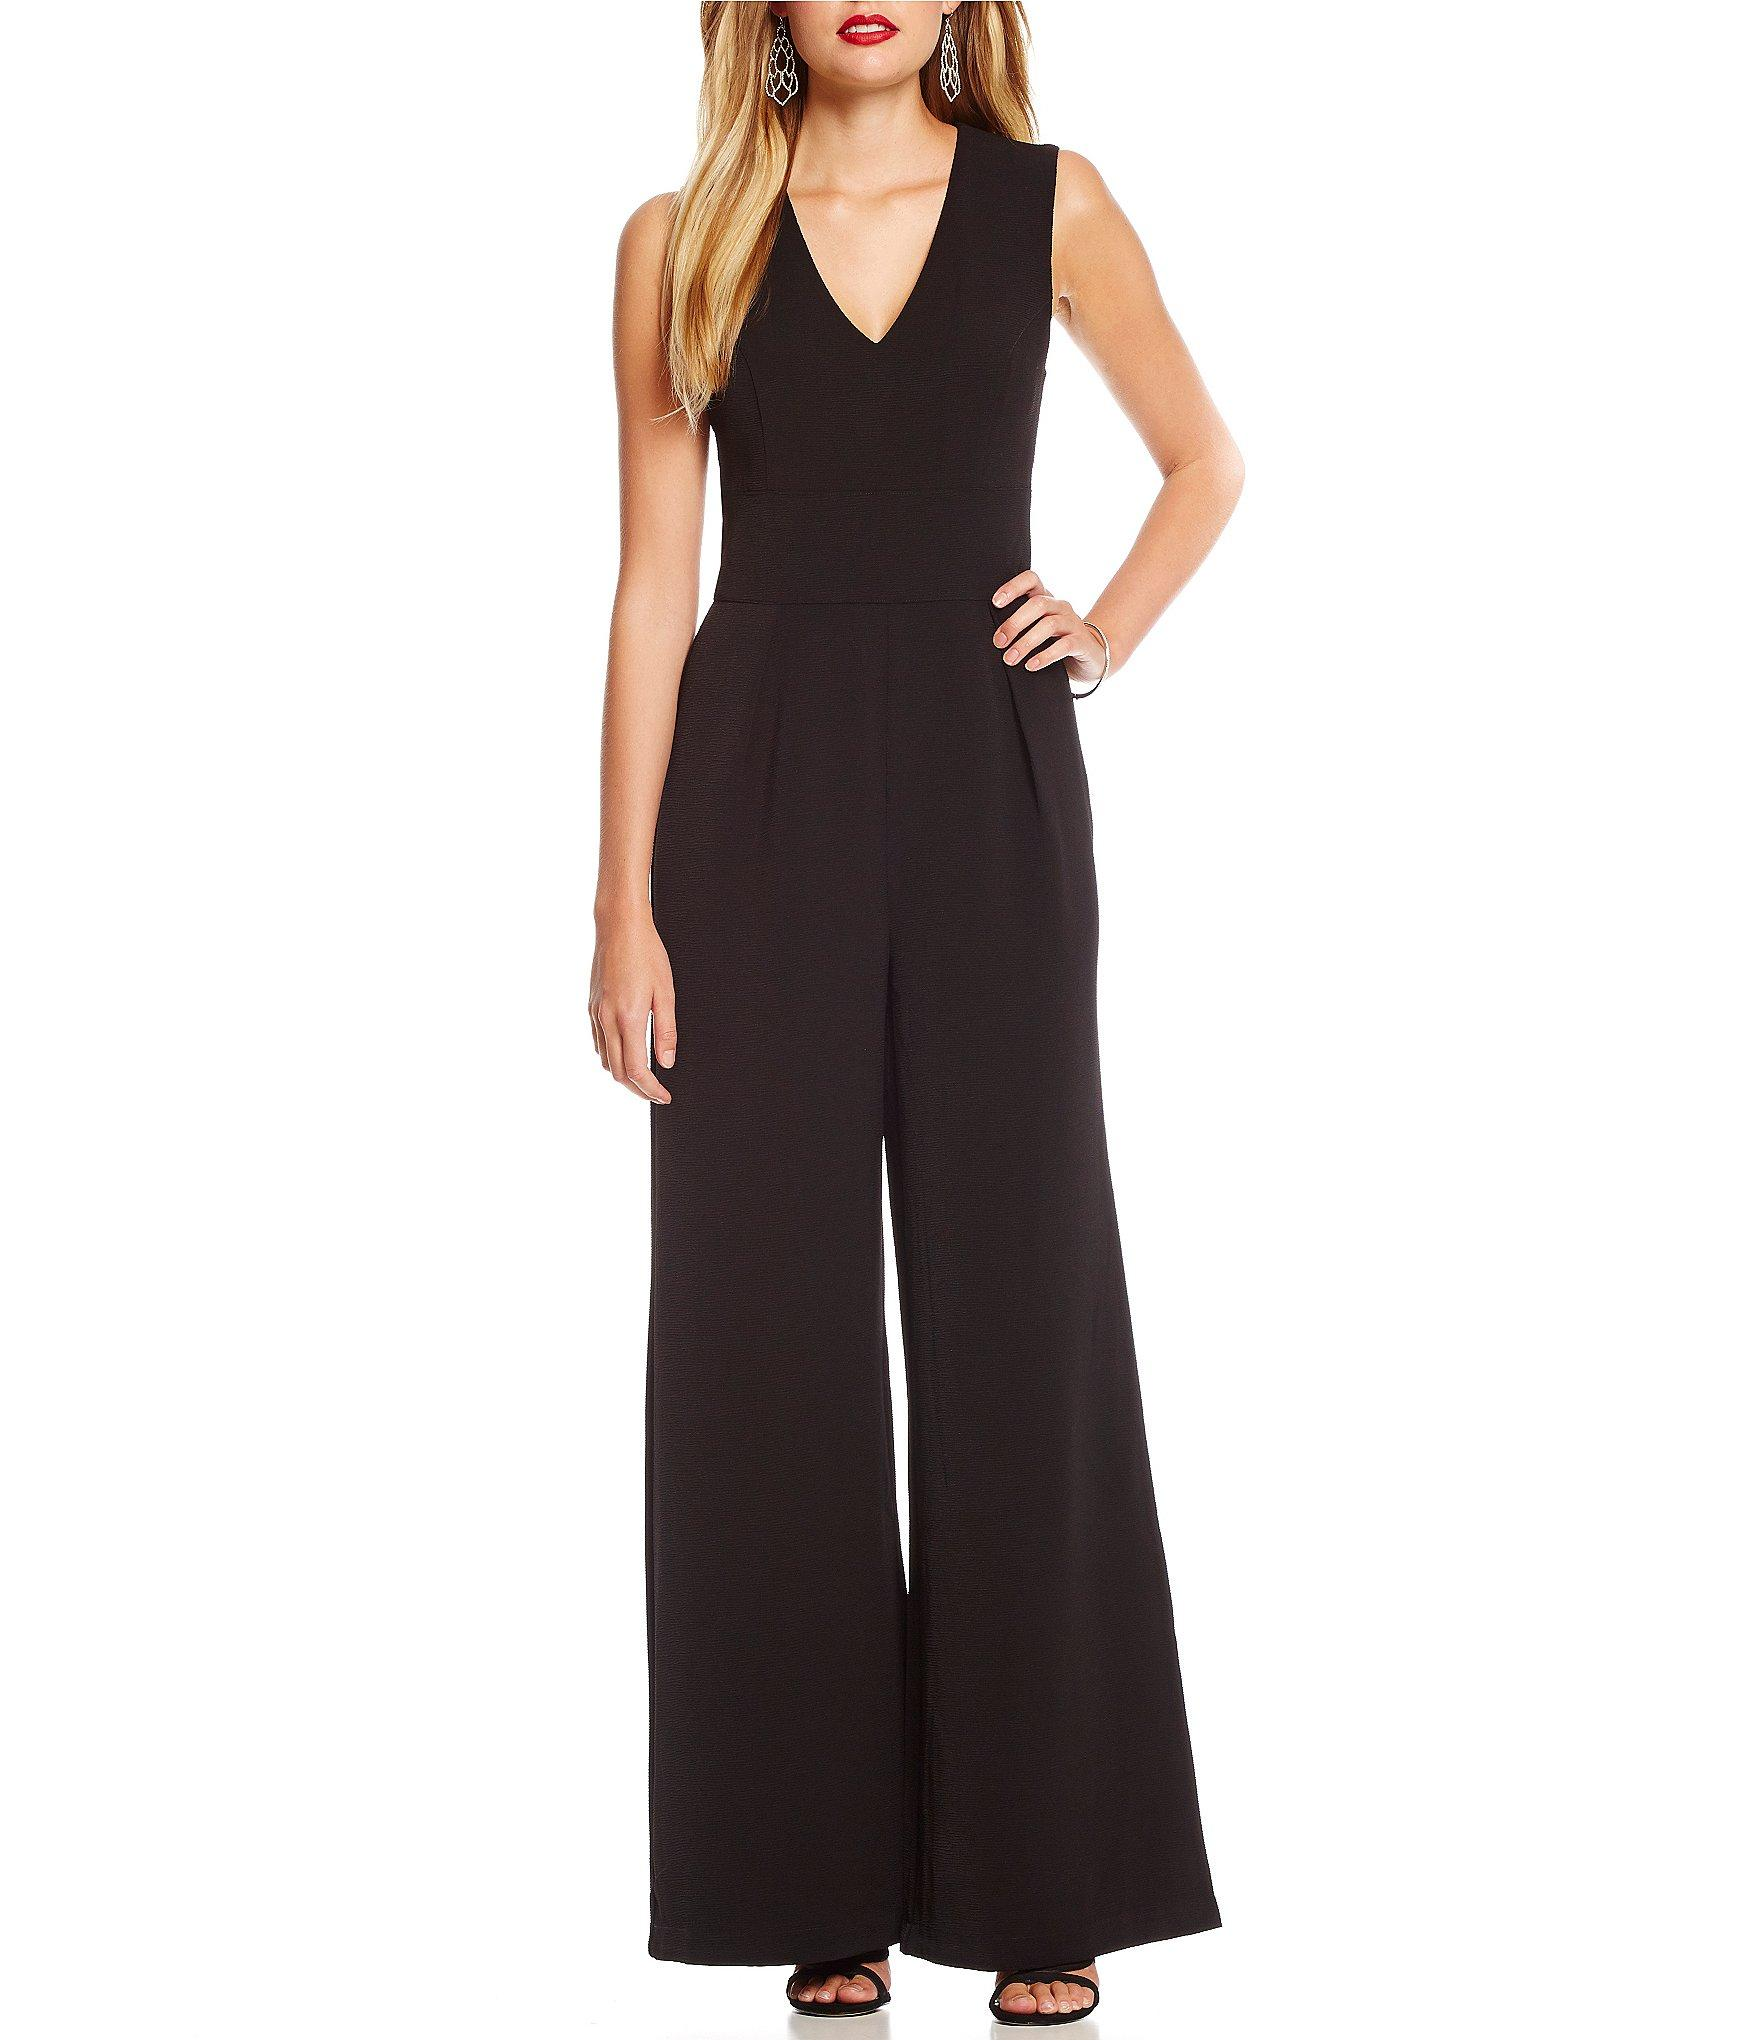 71a0c3974b39 Lyst - Sugarlips Sleeveless V-neck Flare-leg Jumpsuit in Black